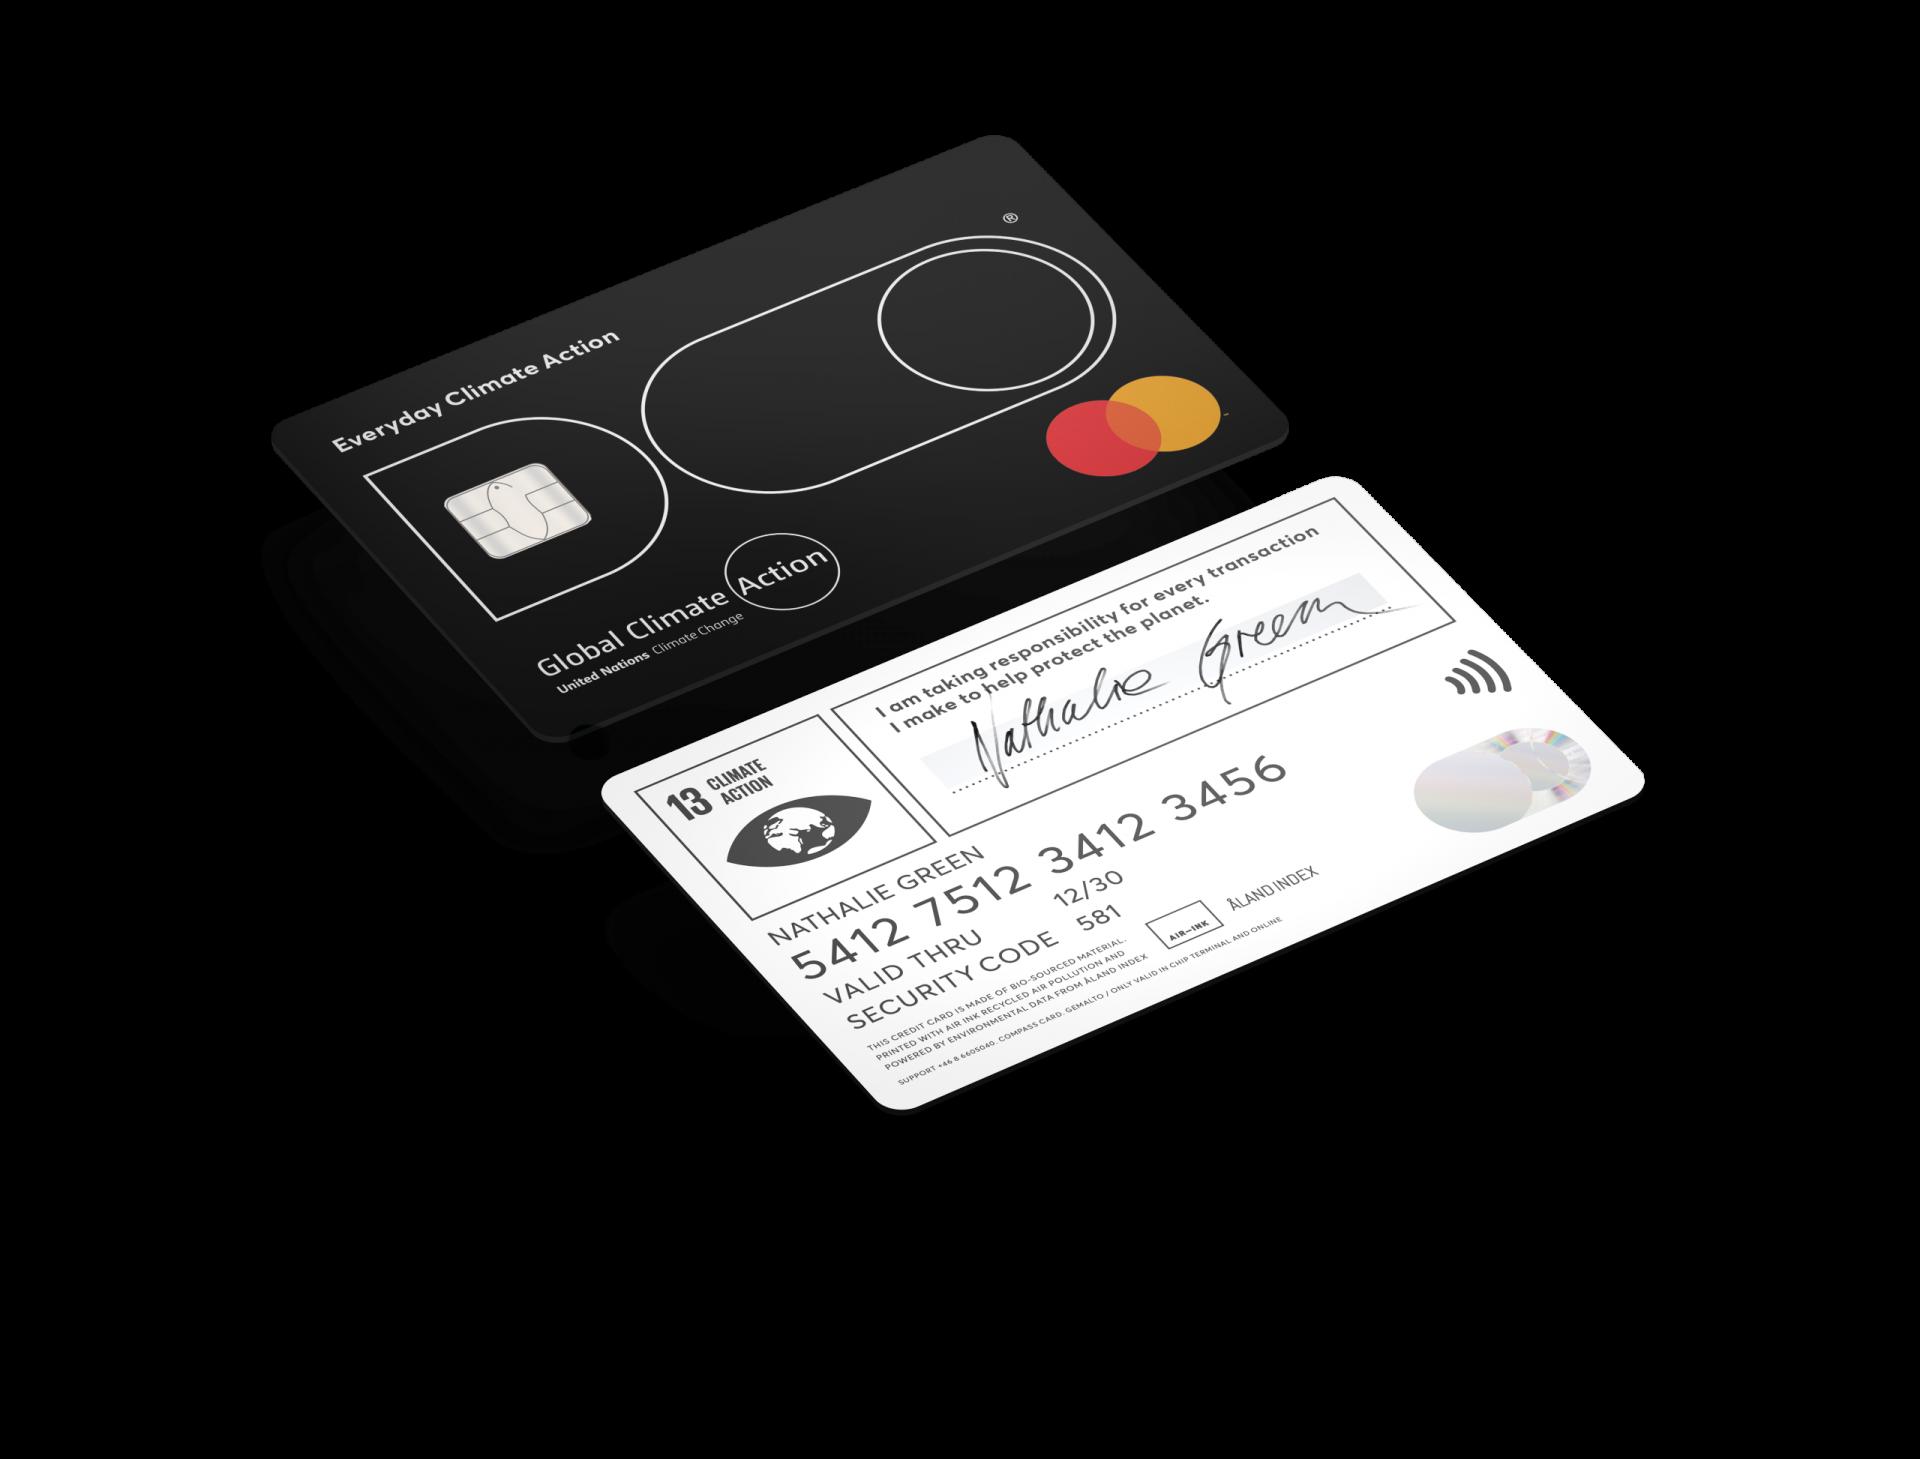 Doconomy's credit card